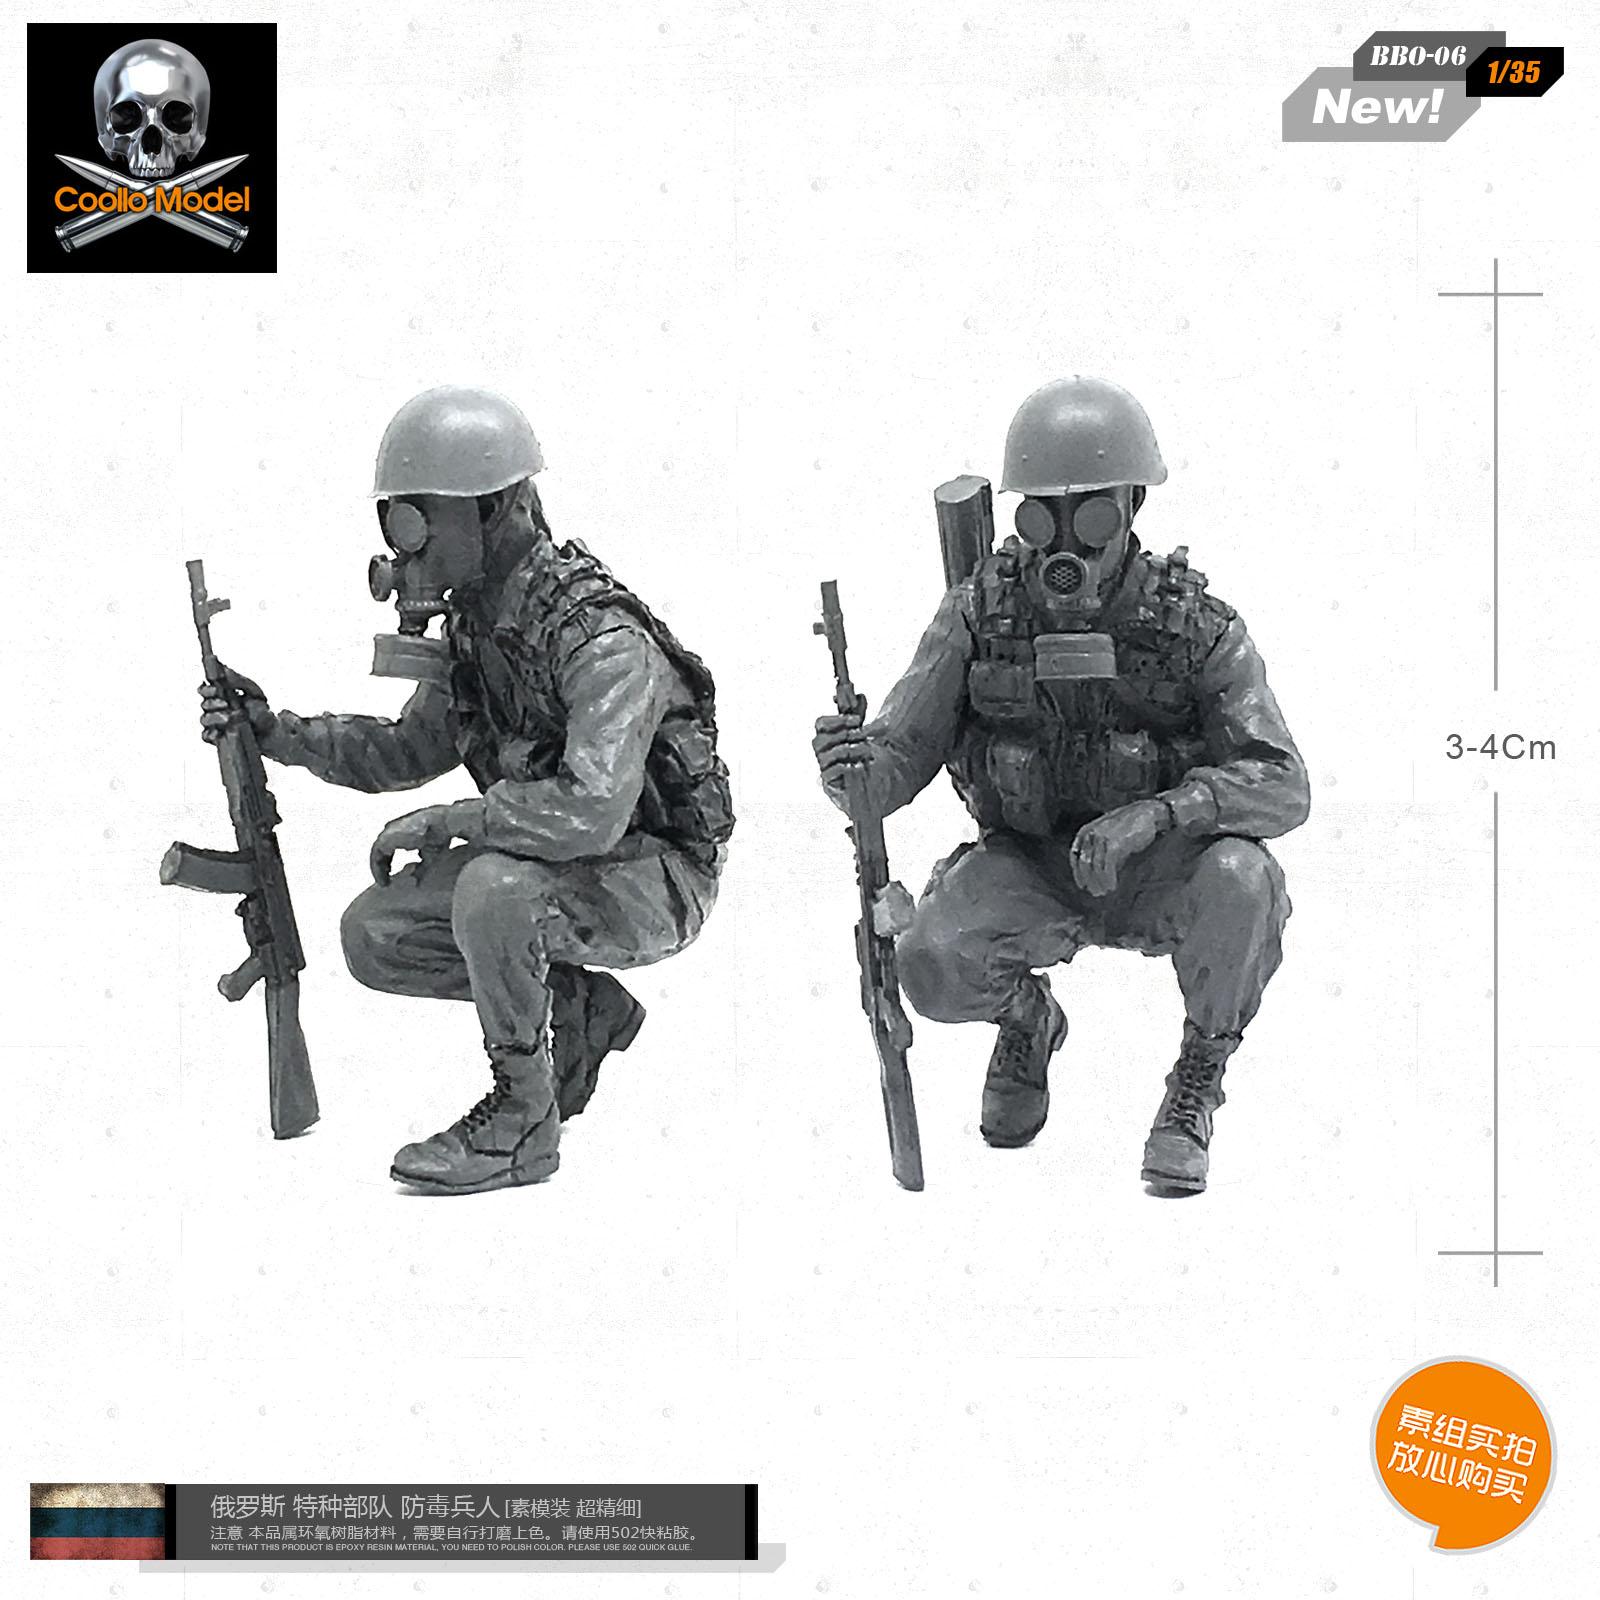 1/35 Resin Kits Model Soilder Russian Special Forces Anti-virus Resin Army Self-assembled BBO-06